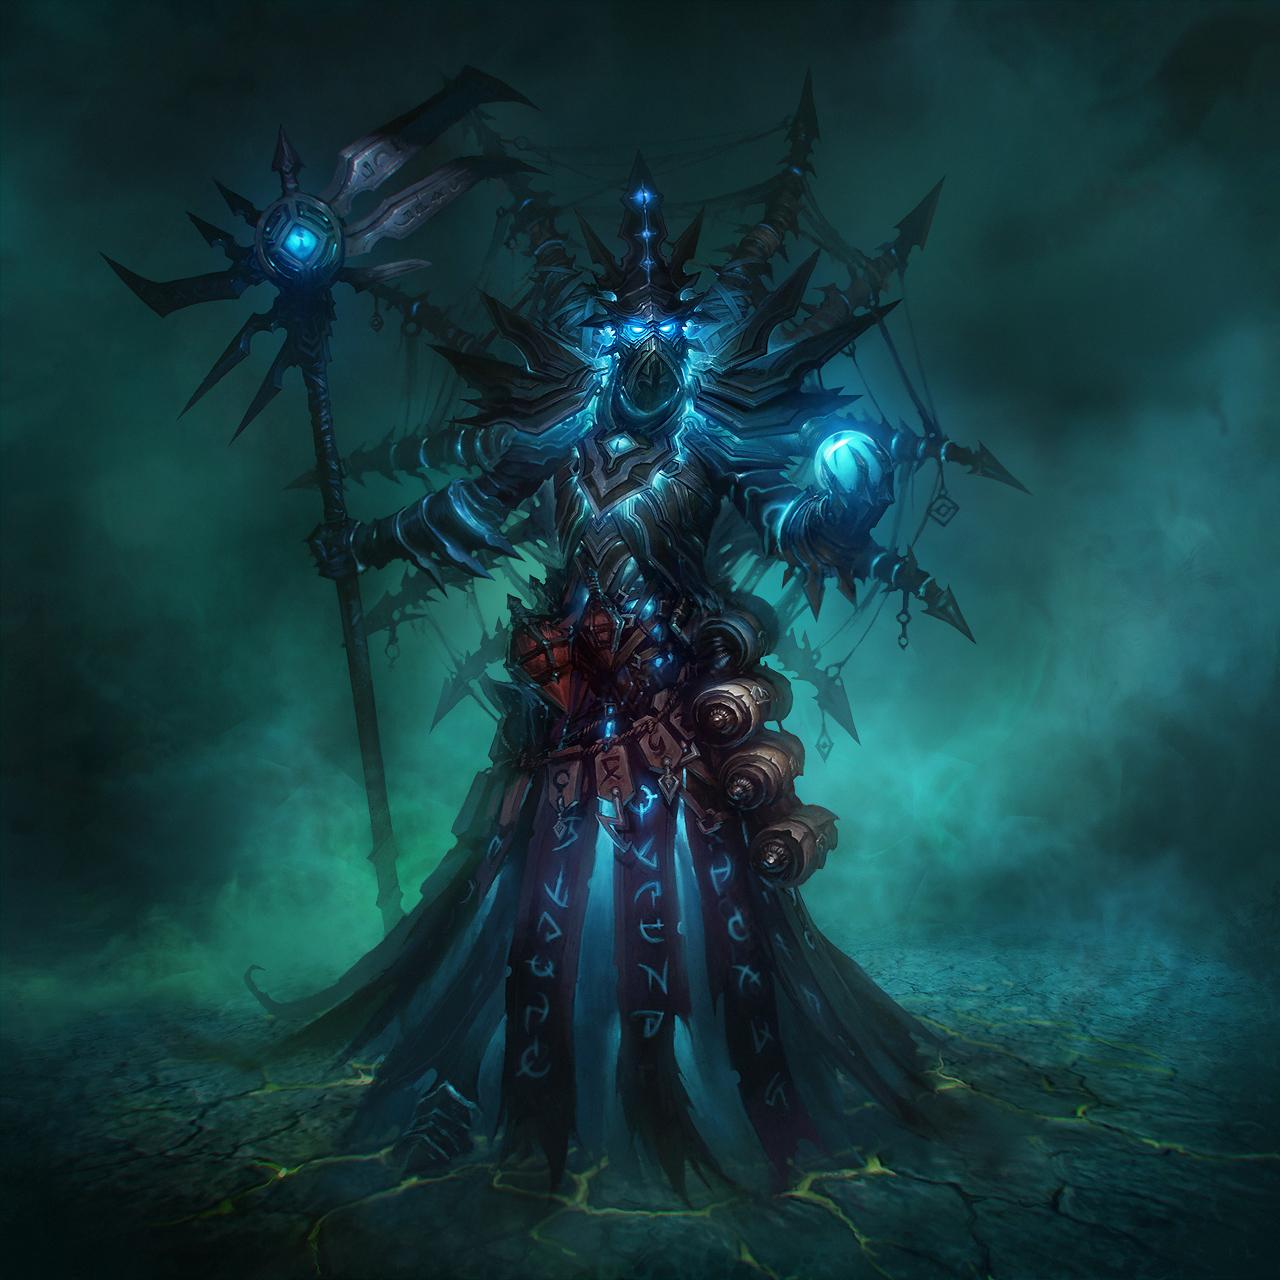 Slave of Darkness